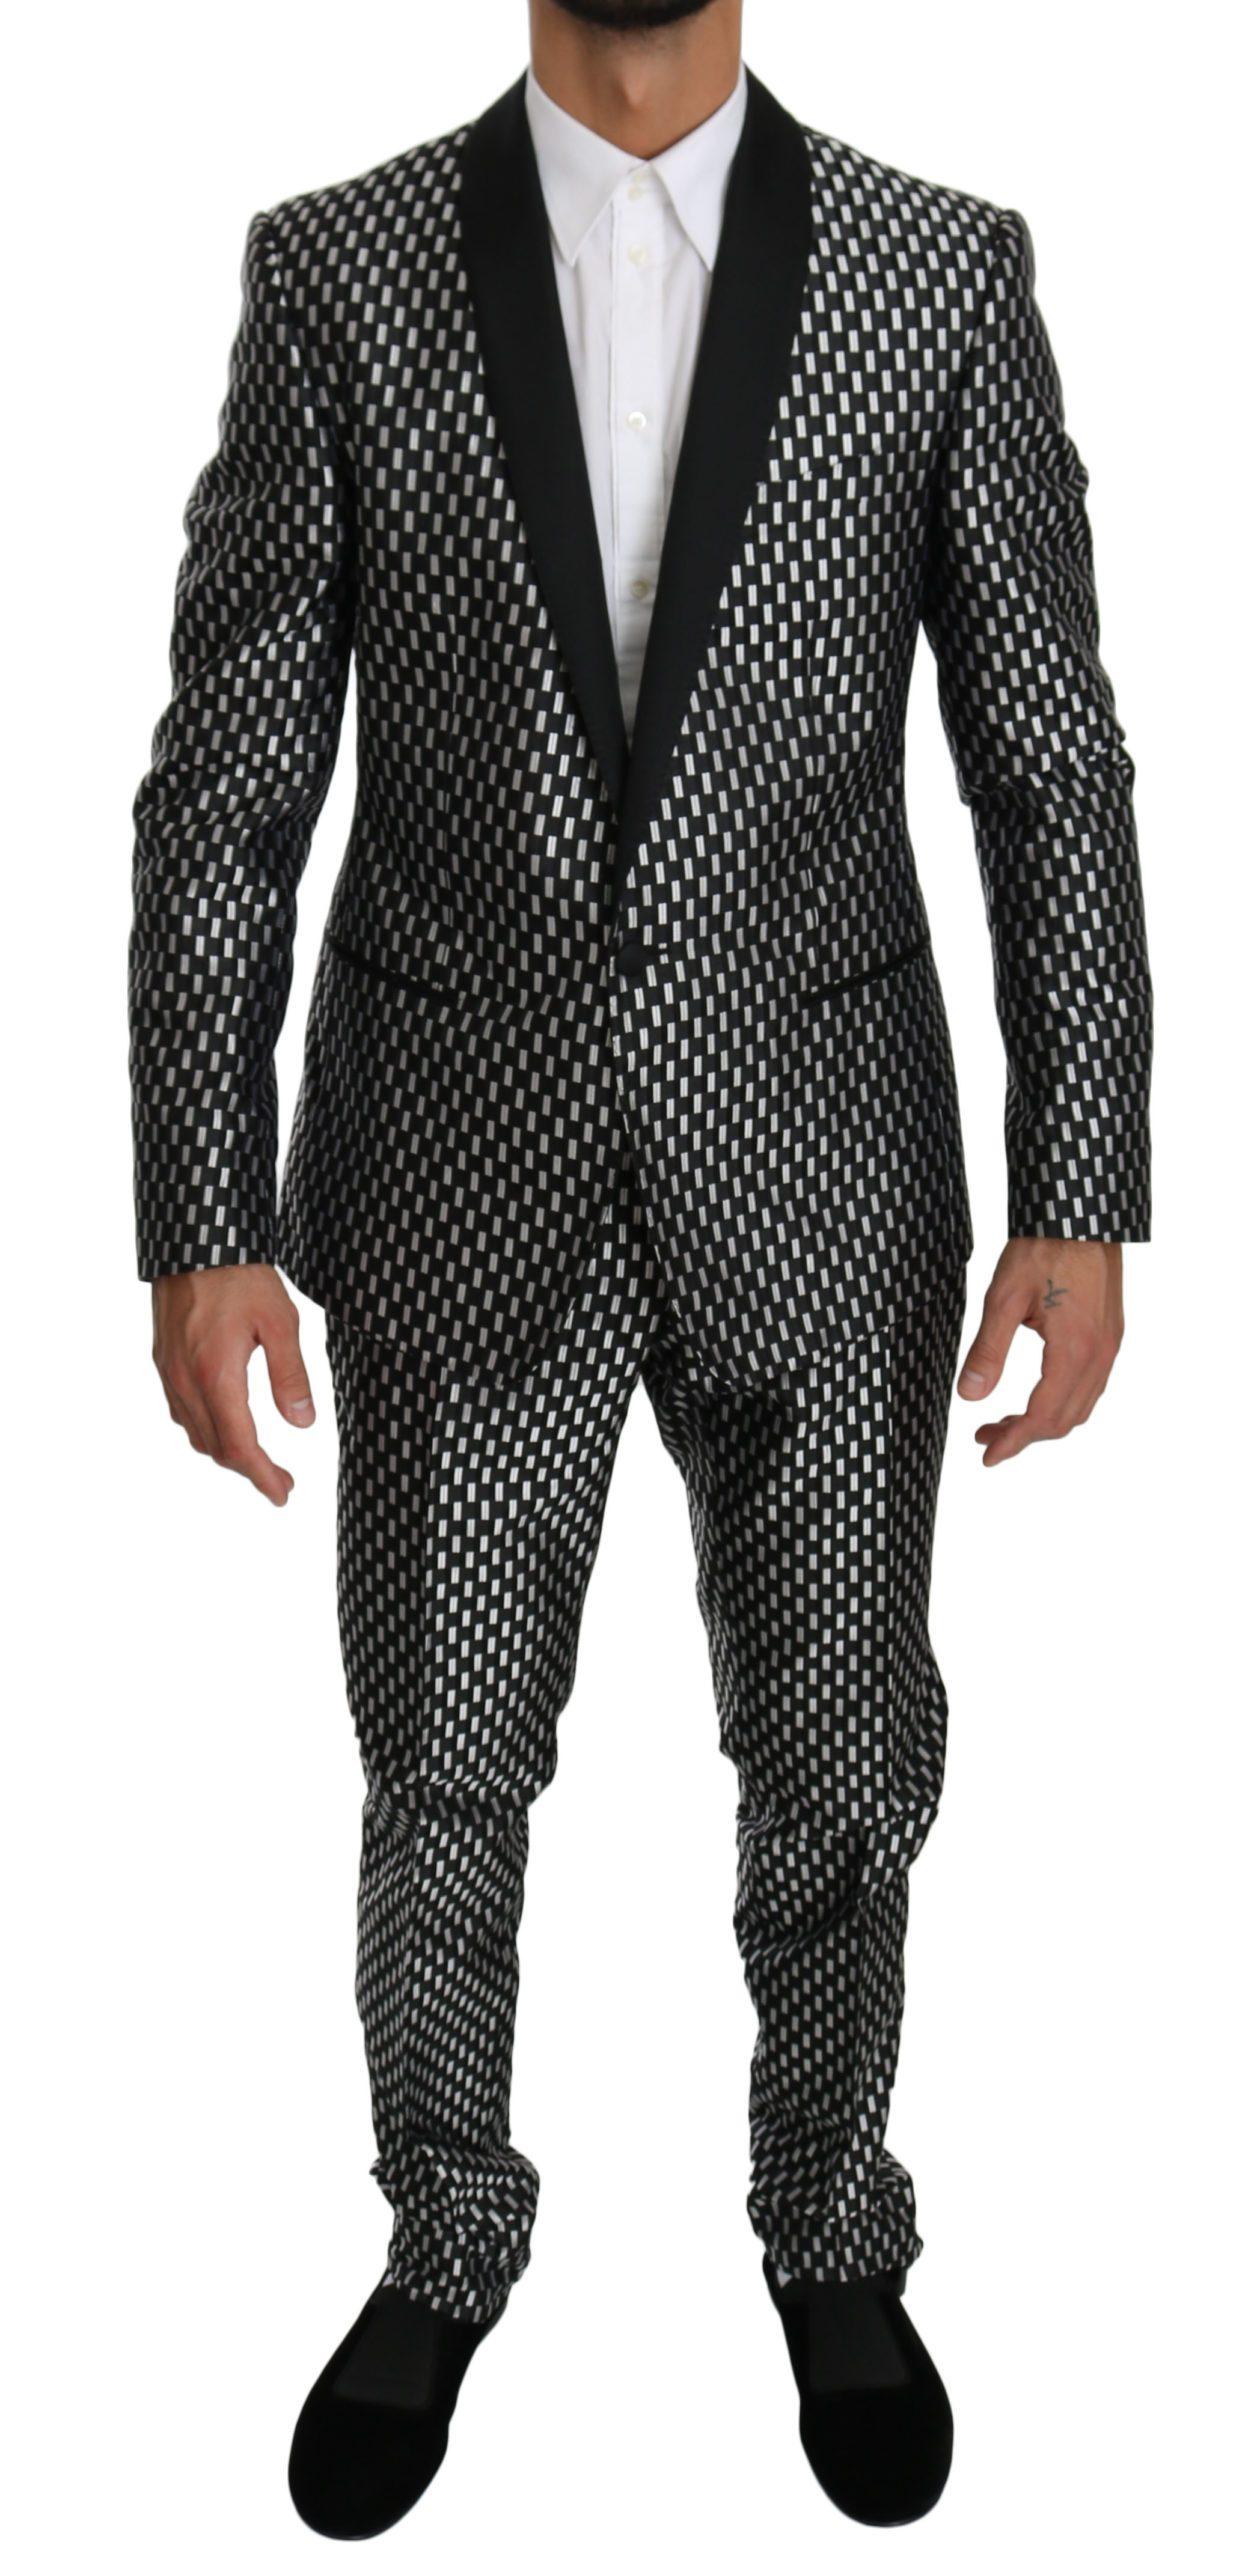 Dolce & Gabbana Men's Slim Fit 2 Piece Silk MARTINI Suit Beige KOS1539 - IT50 | L